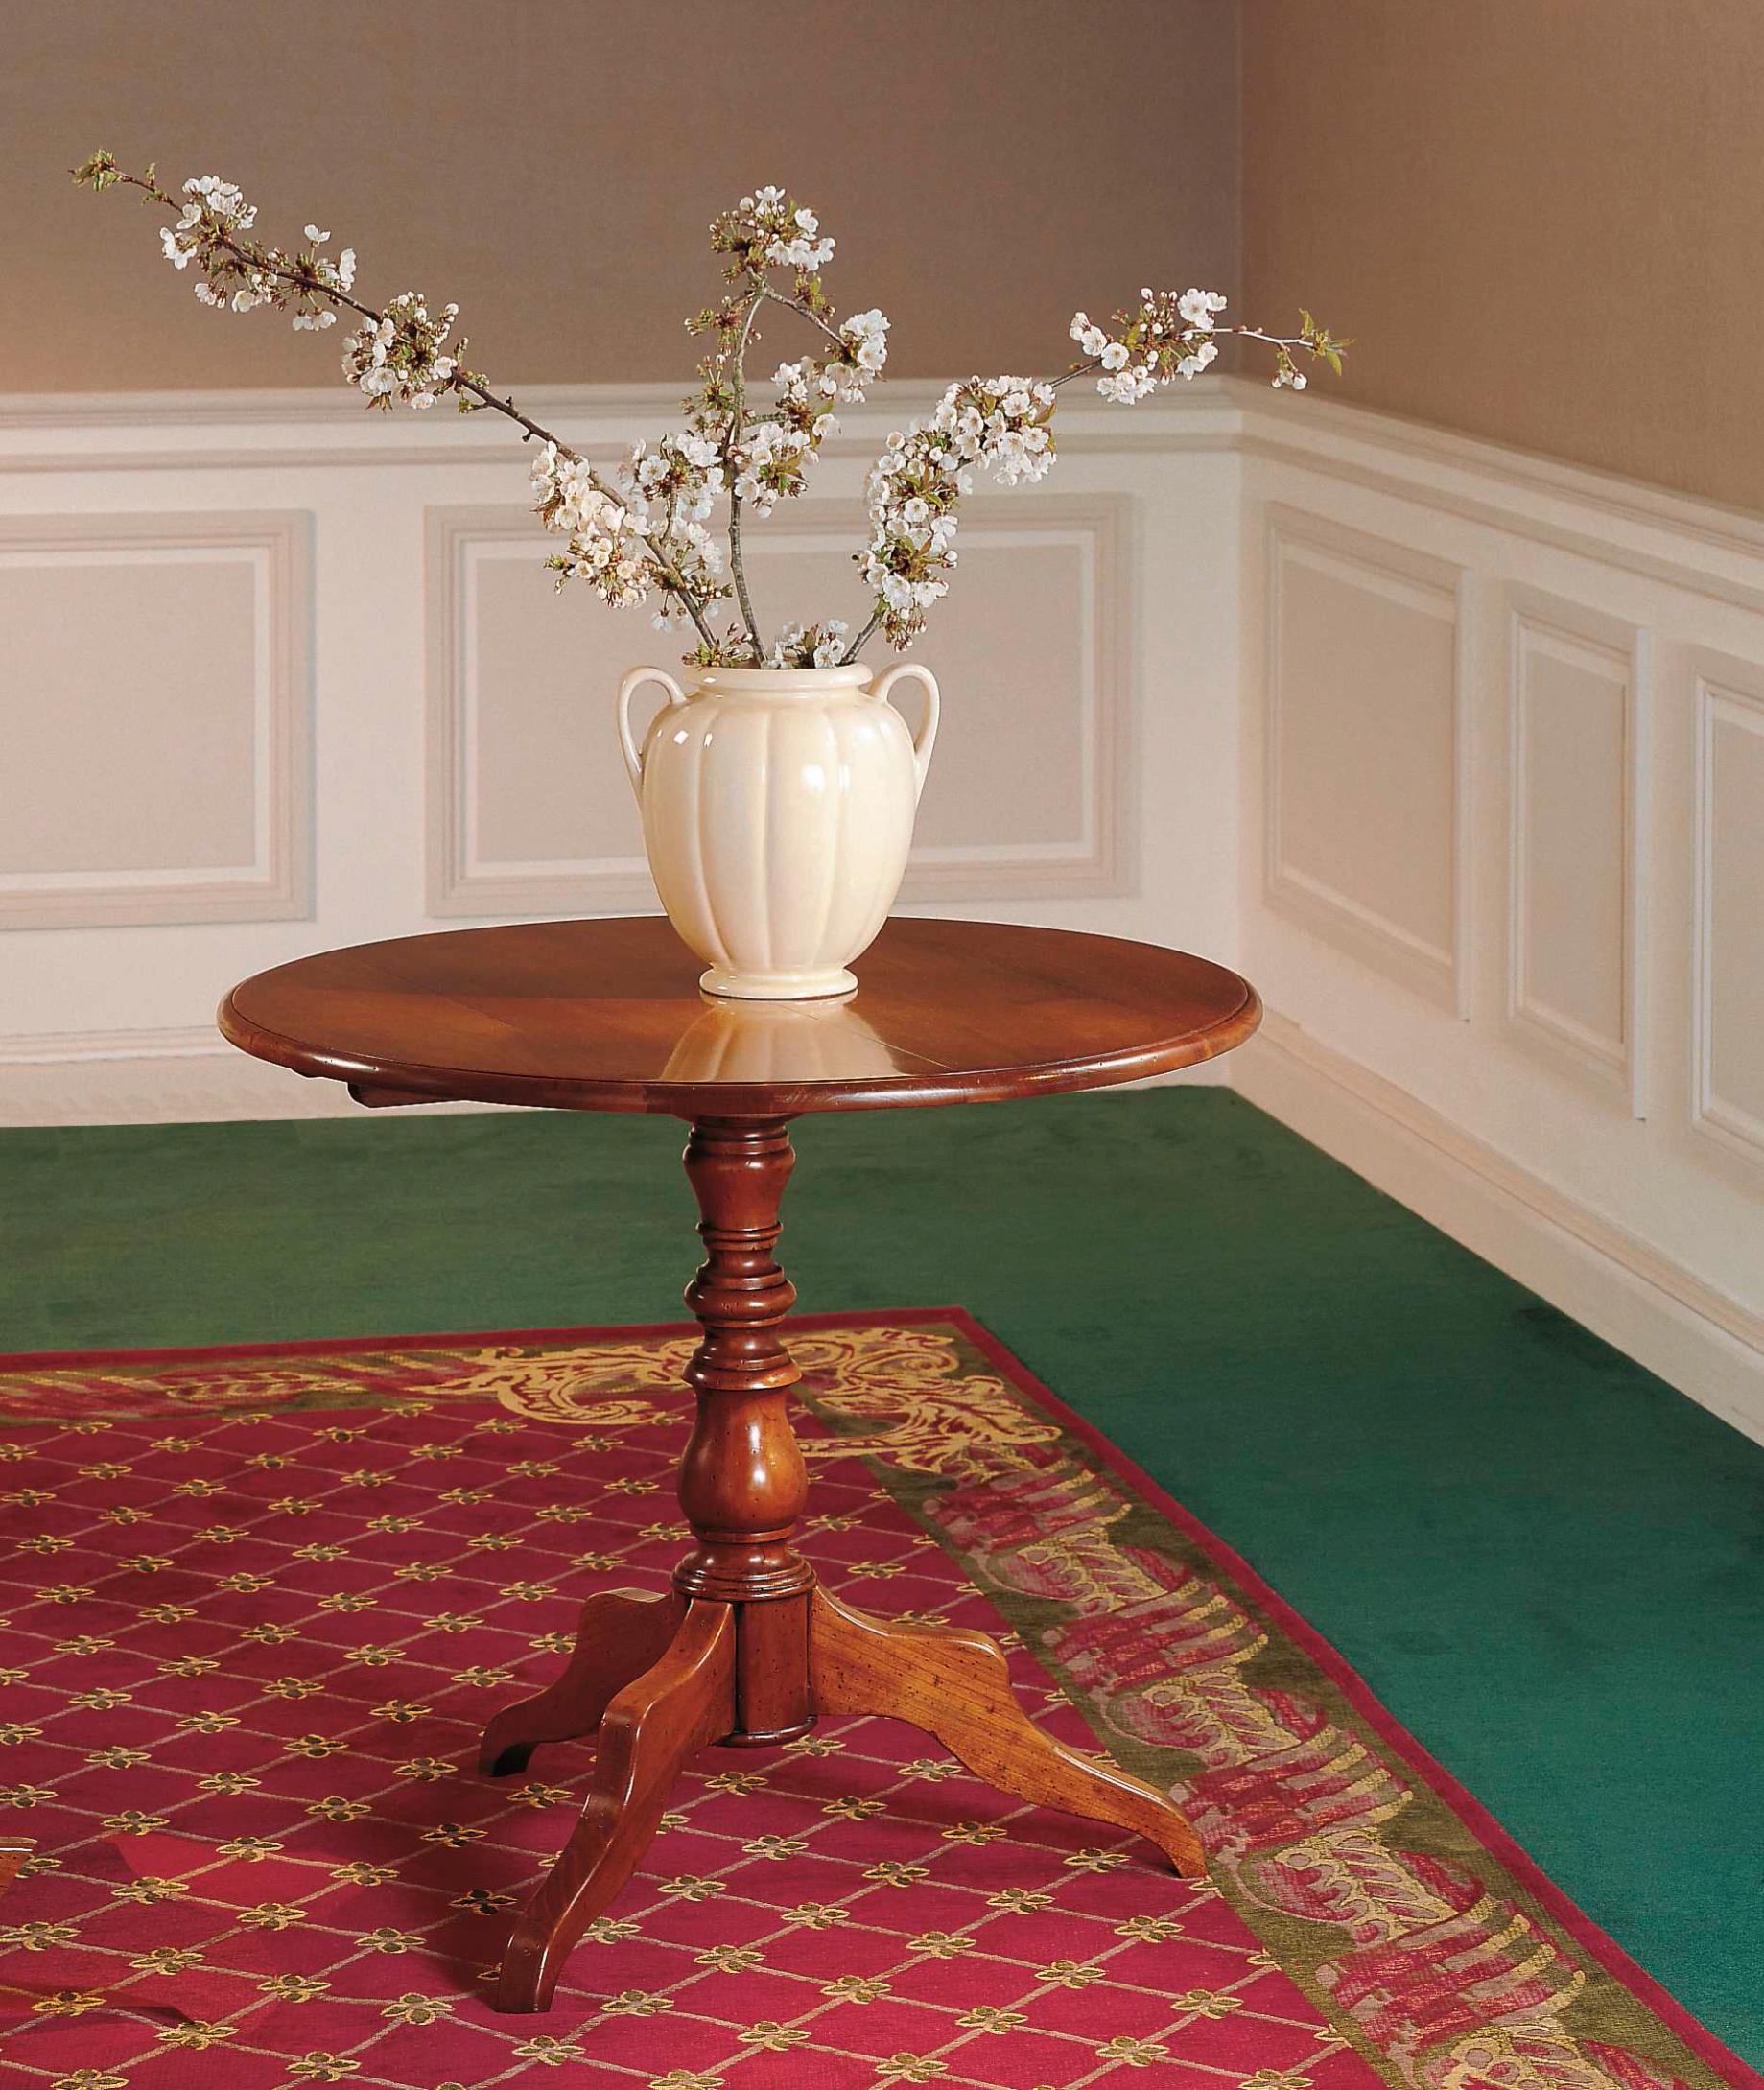 meubles richelieu gu ridon de style louis philippe. Black Bedroom Furniture Sets. Home Design Ideas